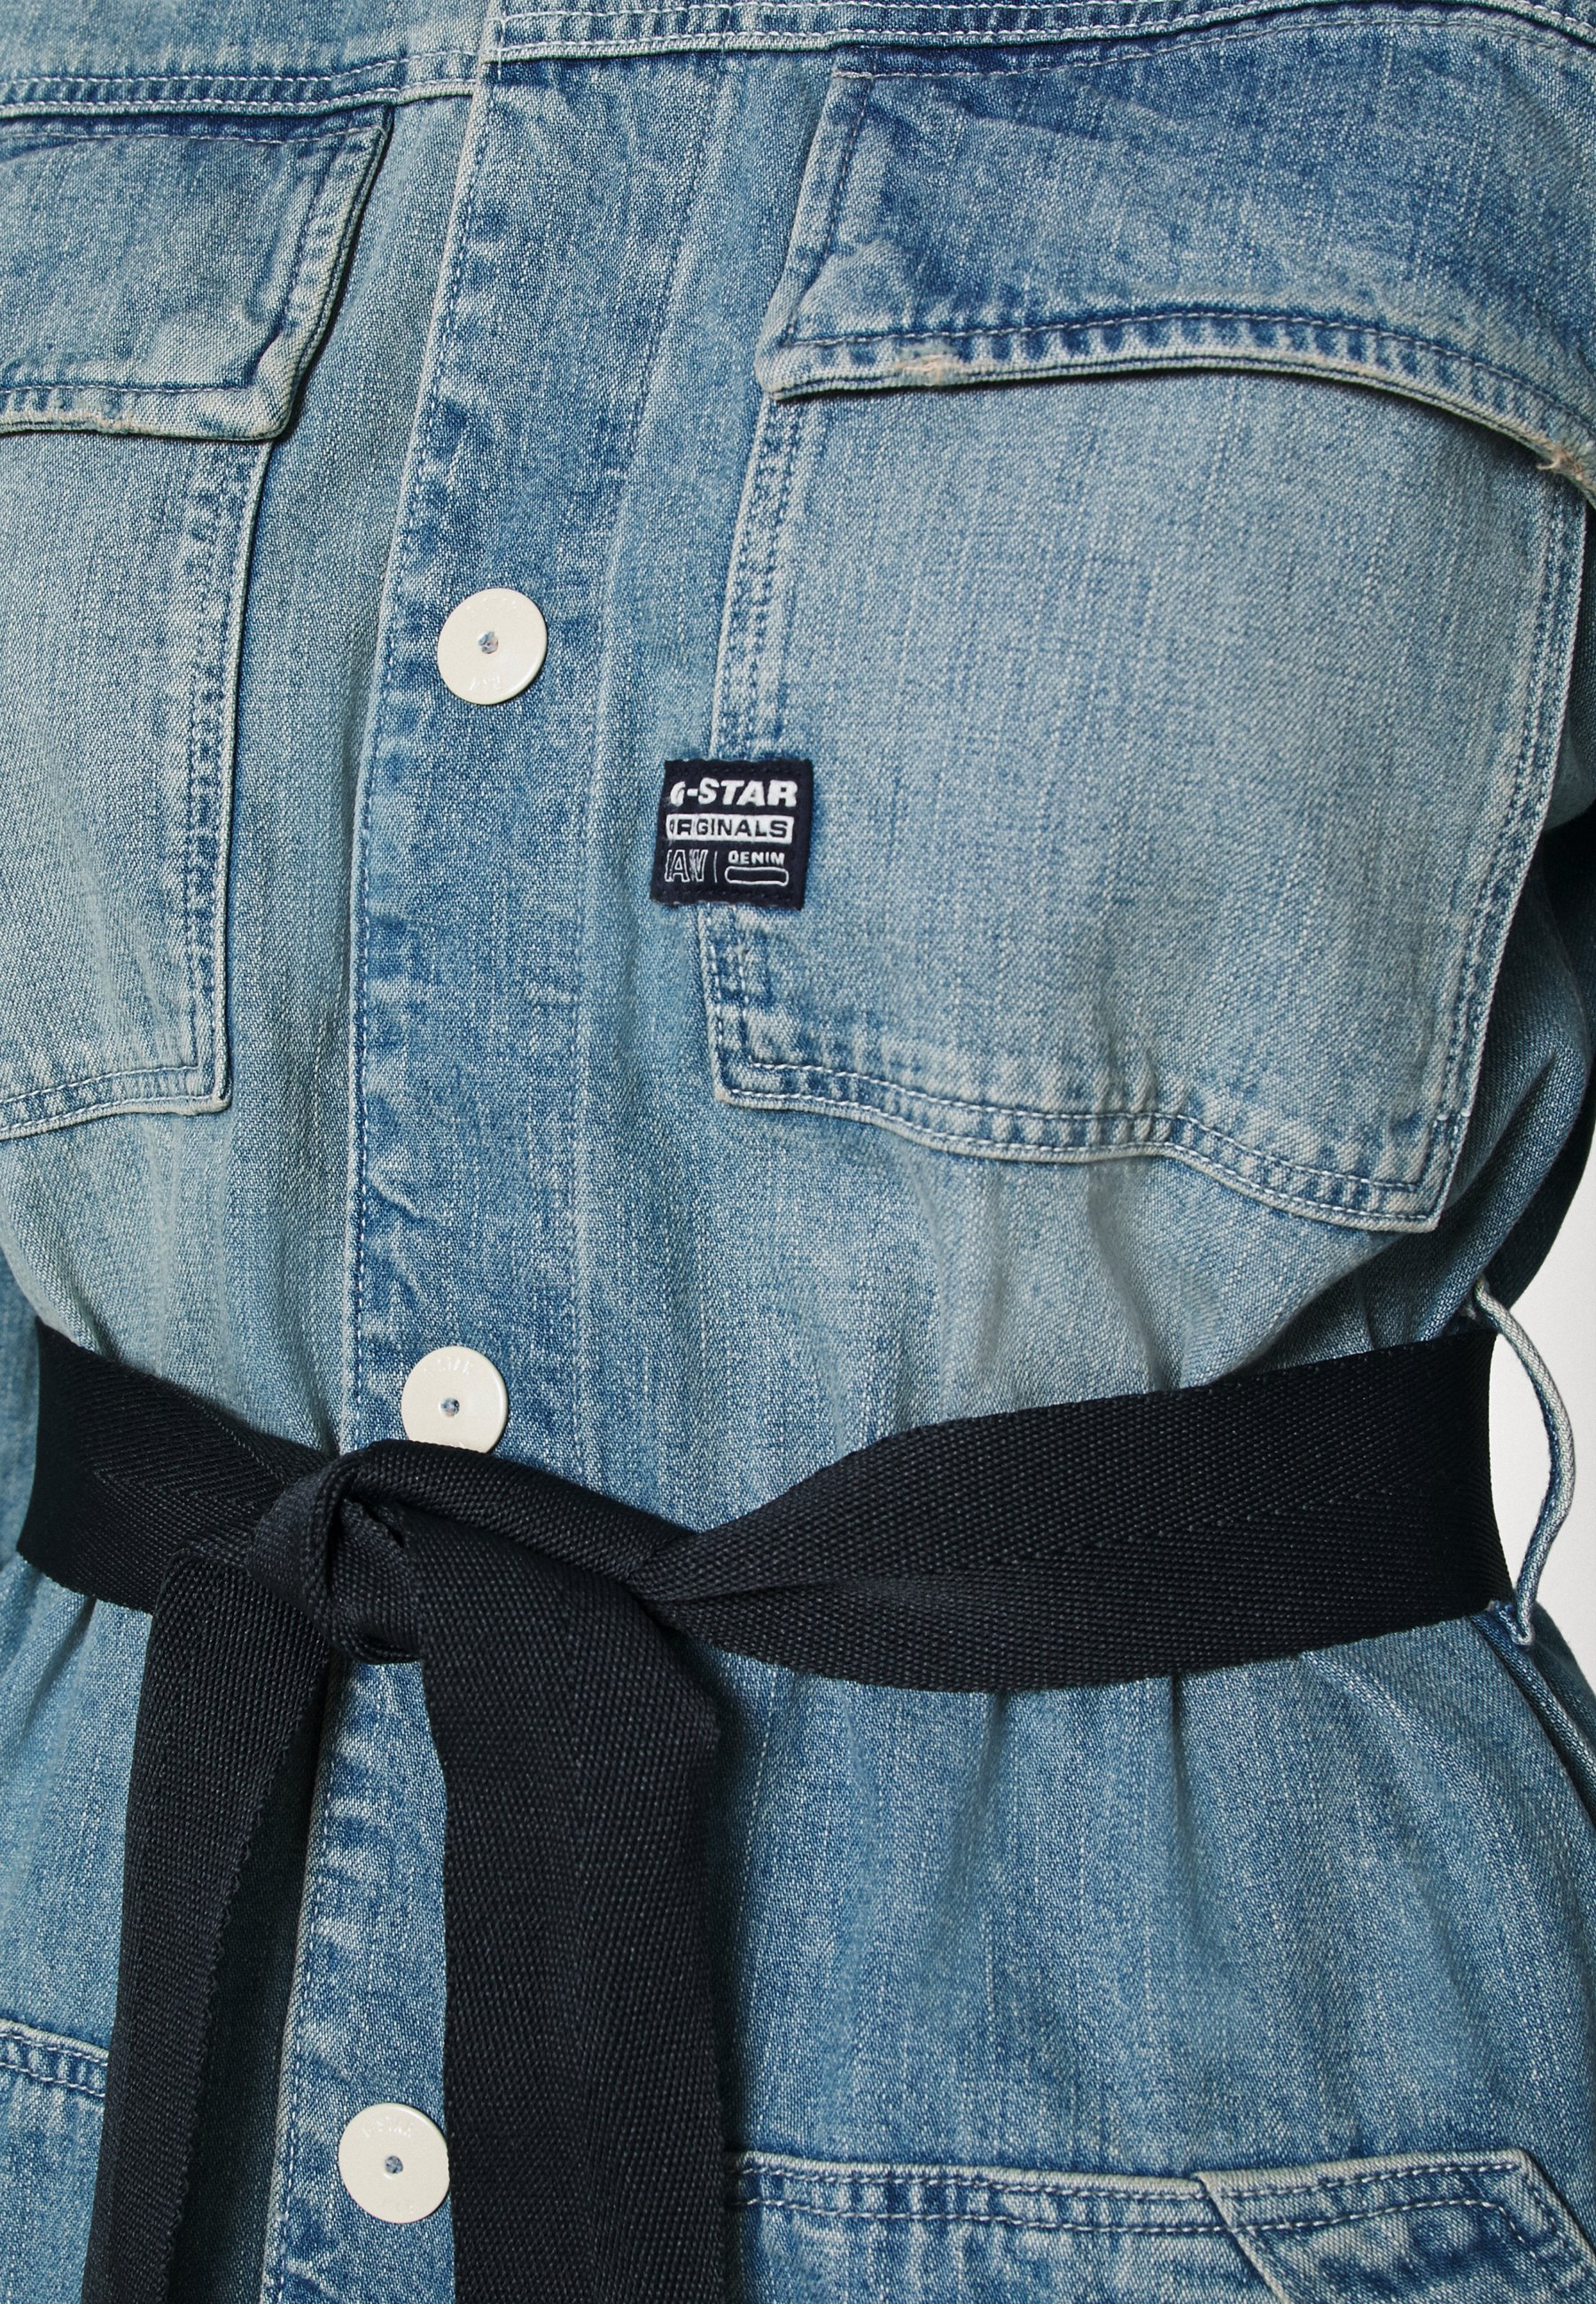 GStar SHIRT DRESS Jeanskleid vintage marine blue/bleached denim